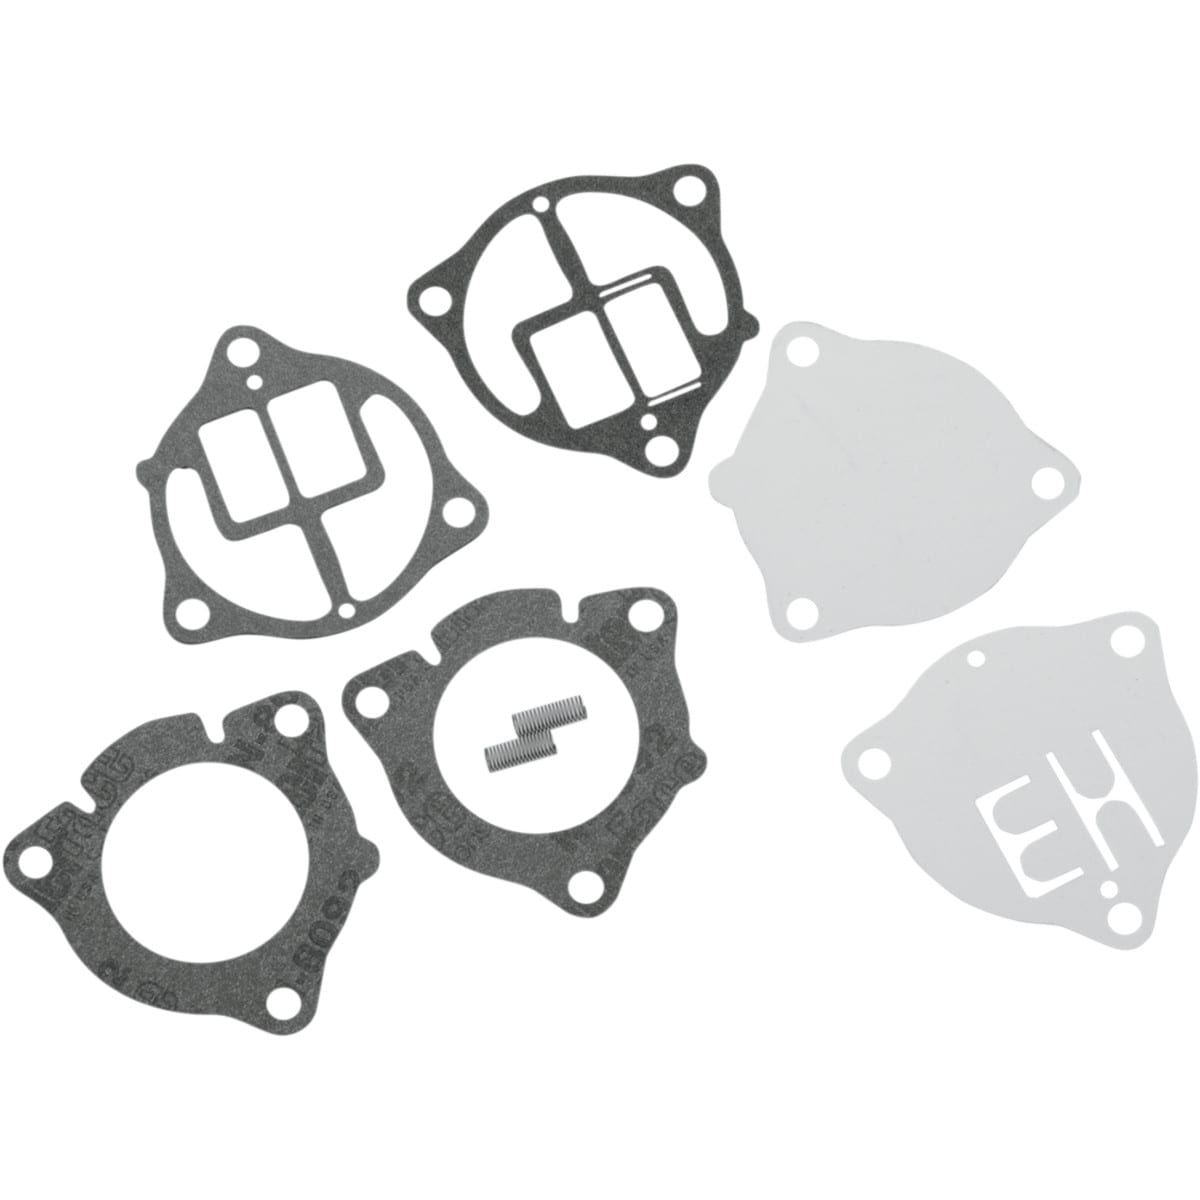 Winderosa Fuel Pump Repair Kit, Yamaha Chassis 8A5-24410-01 For Pump